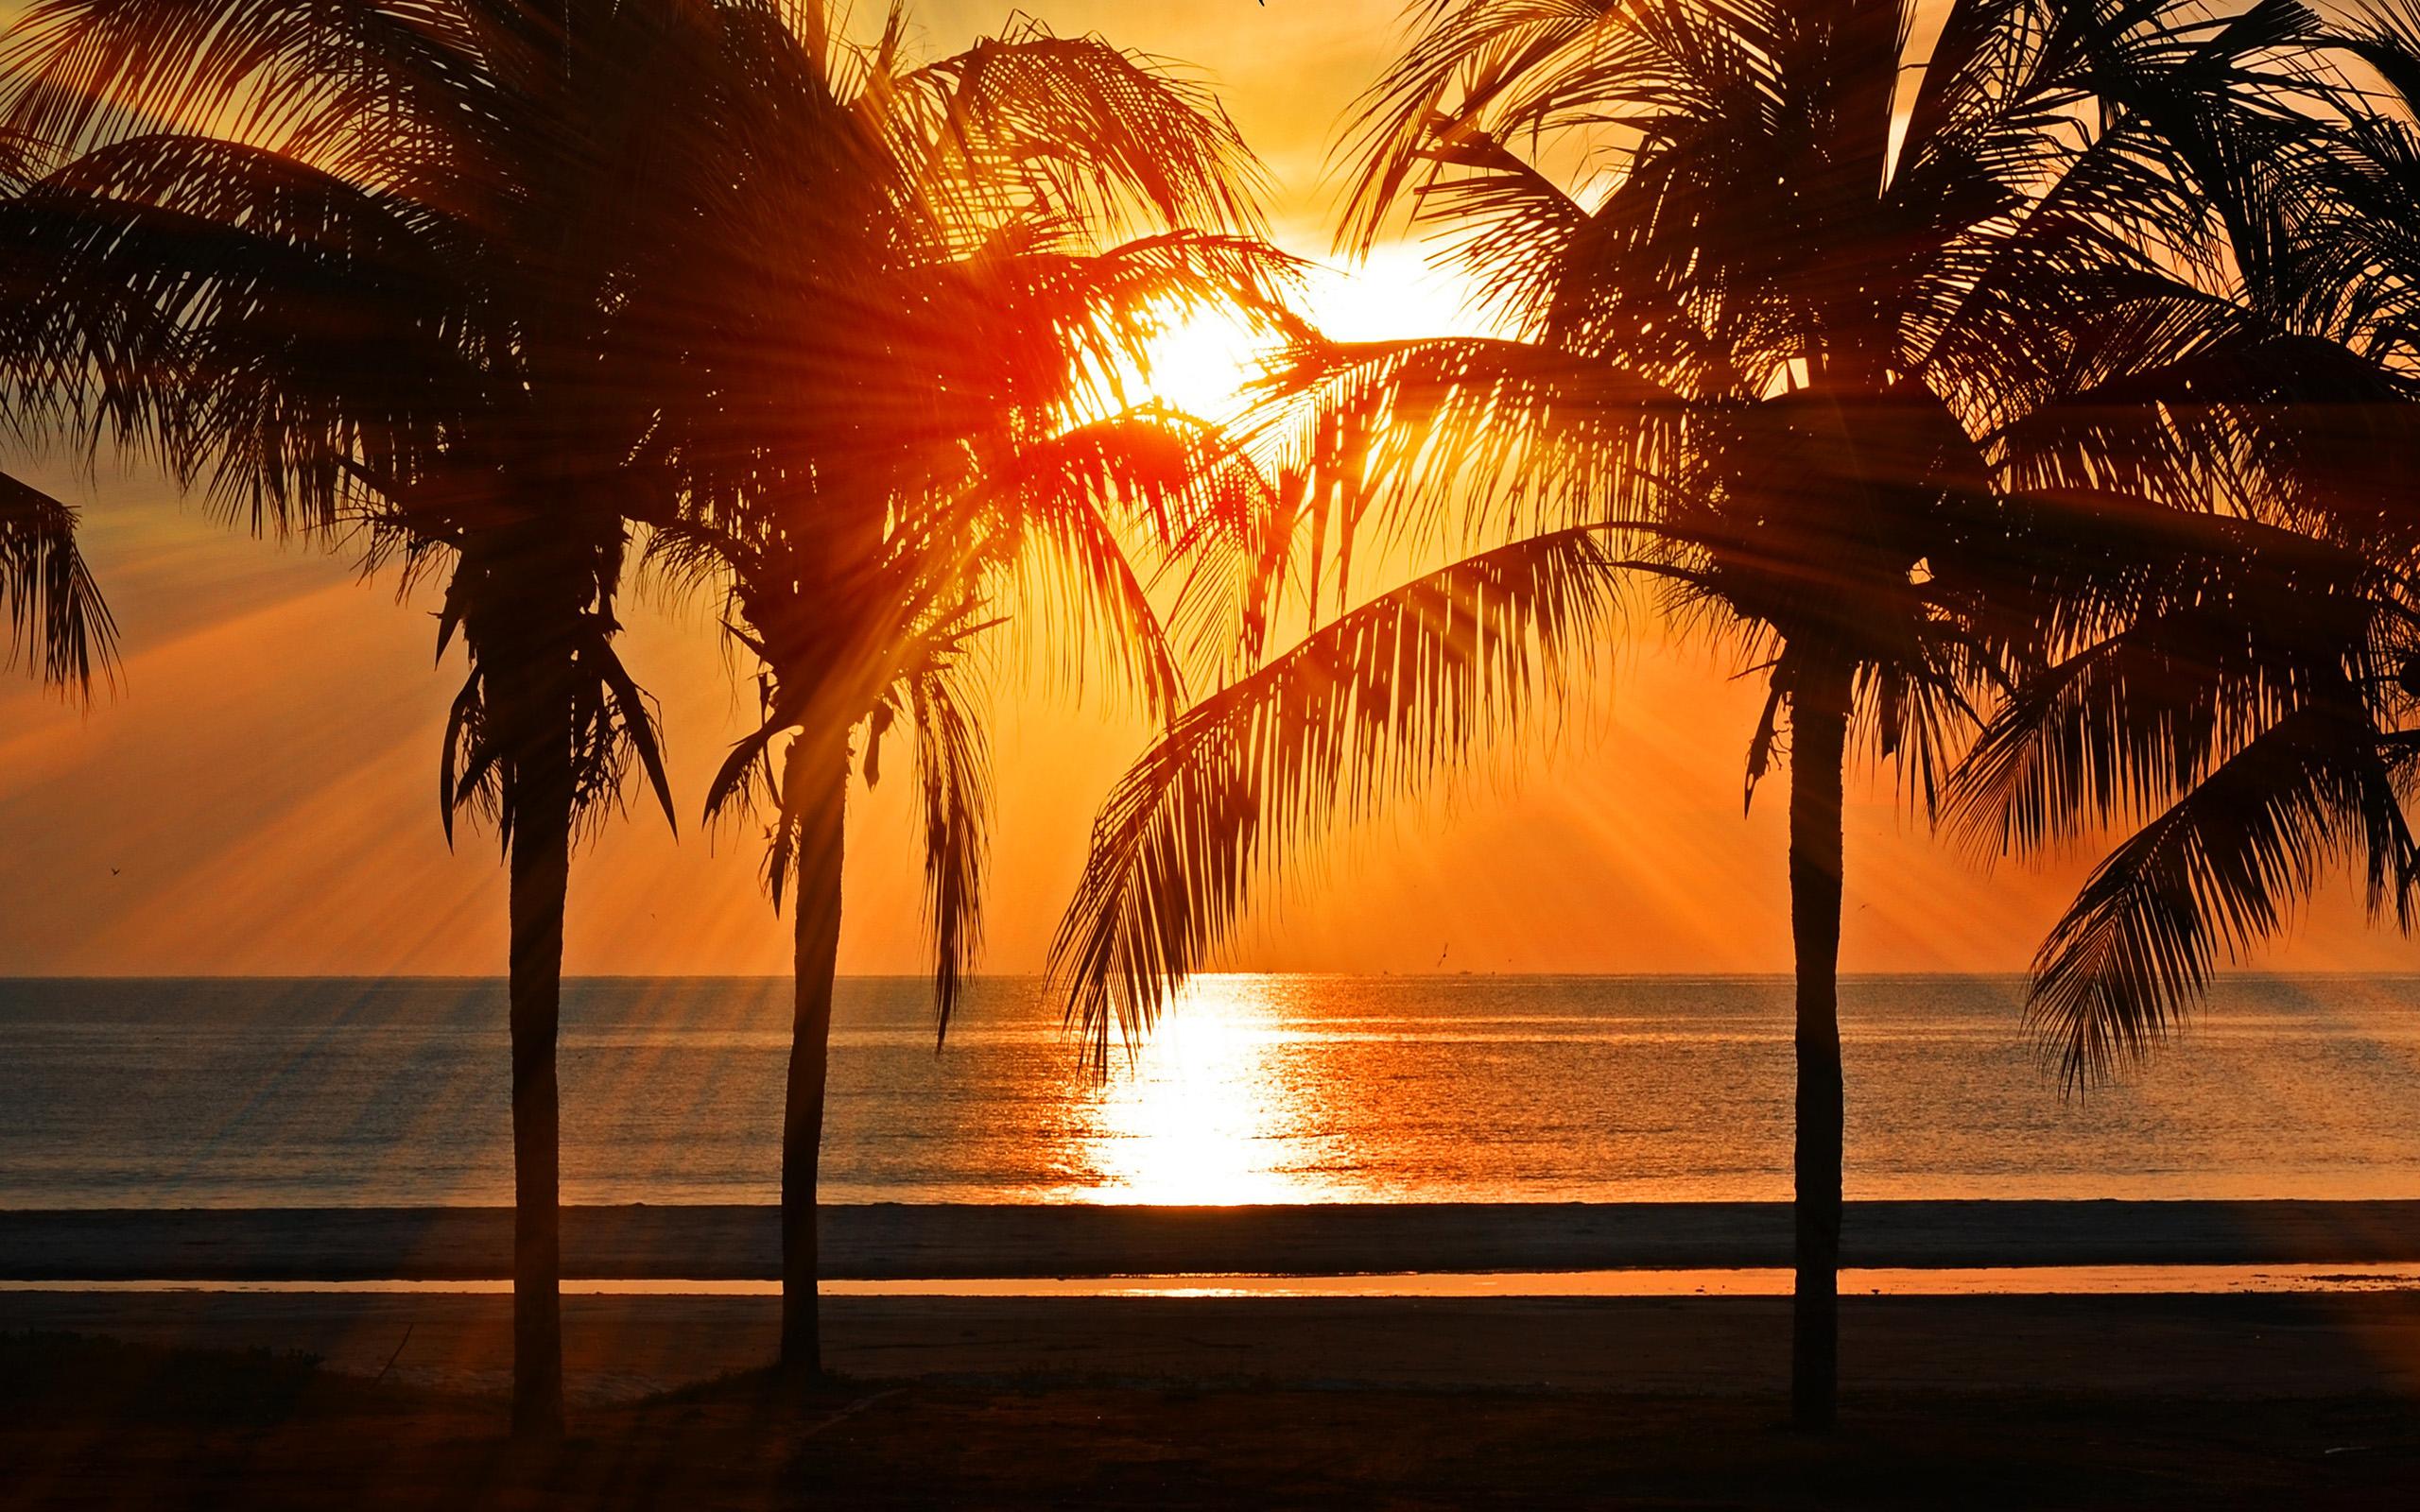 Tropics Palm Trees Sun Beach 4k Hd Desktop Wallpaper For: Nl74-beach-vacation-summer-night-sunset-red-palm-tree